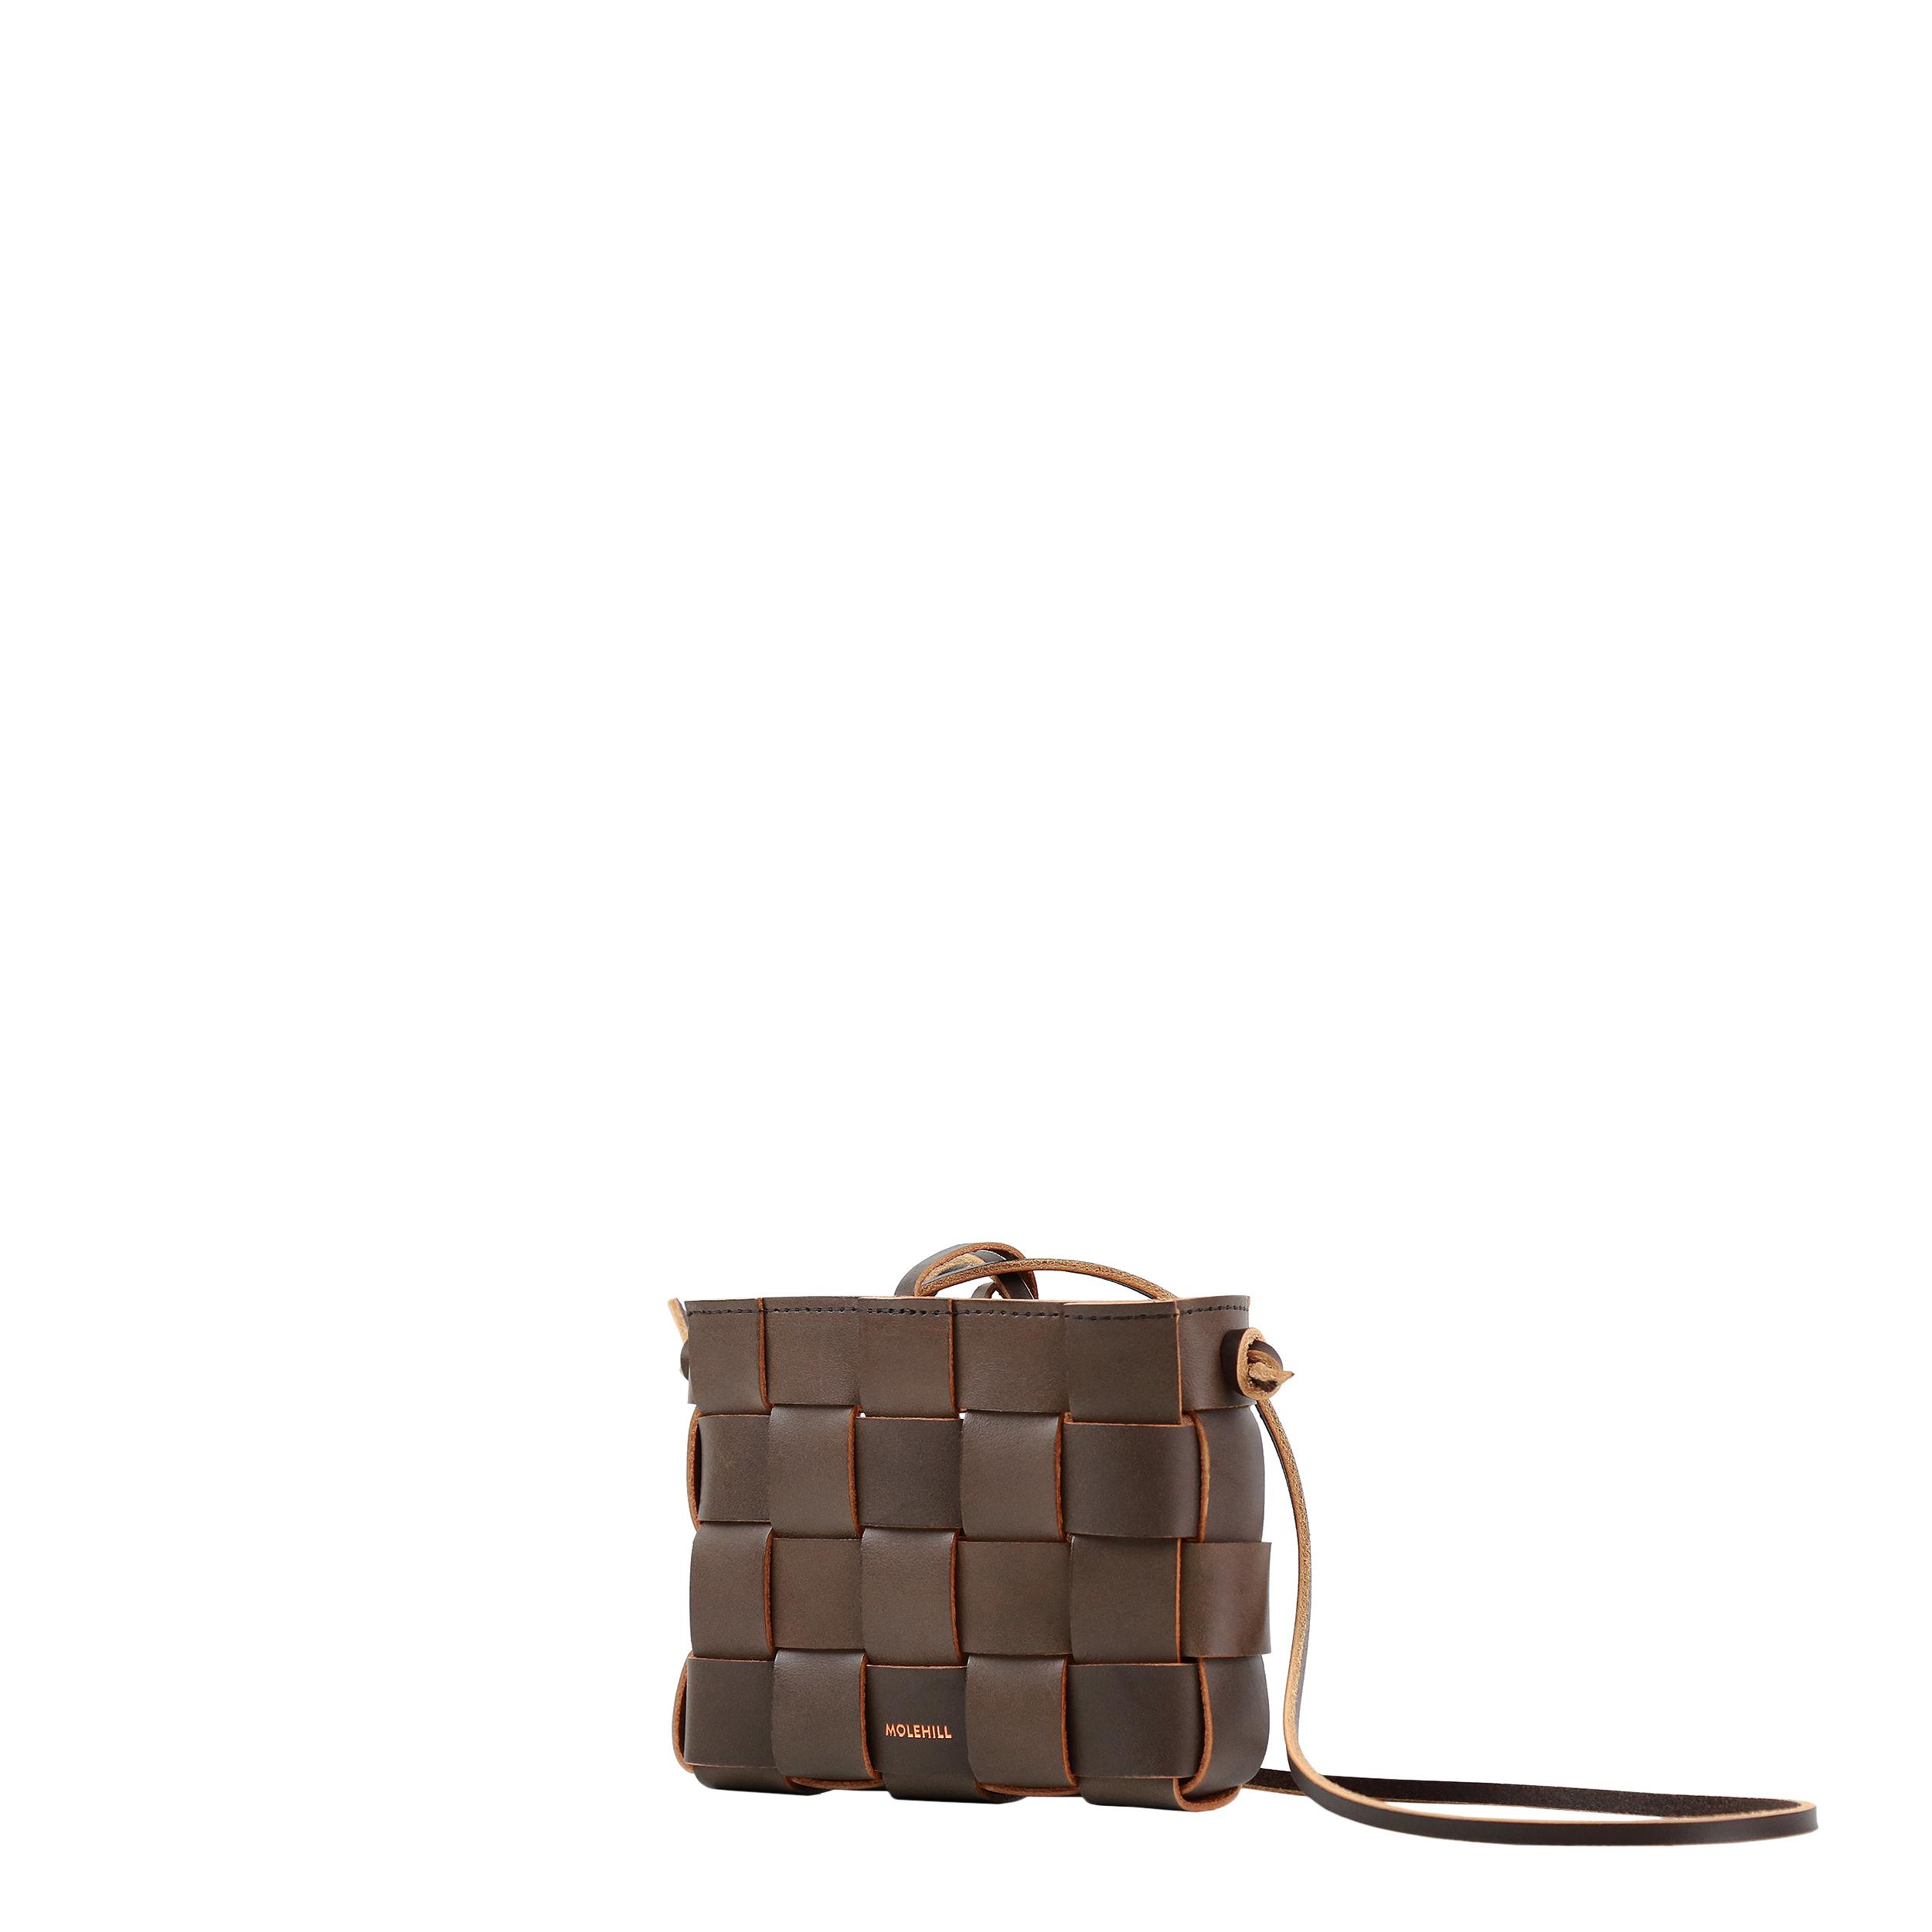 Pane Mini Crossbody Woven Bag Light Chocolate-4